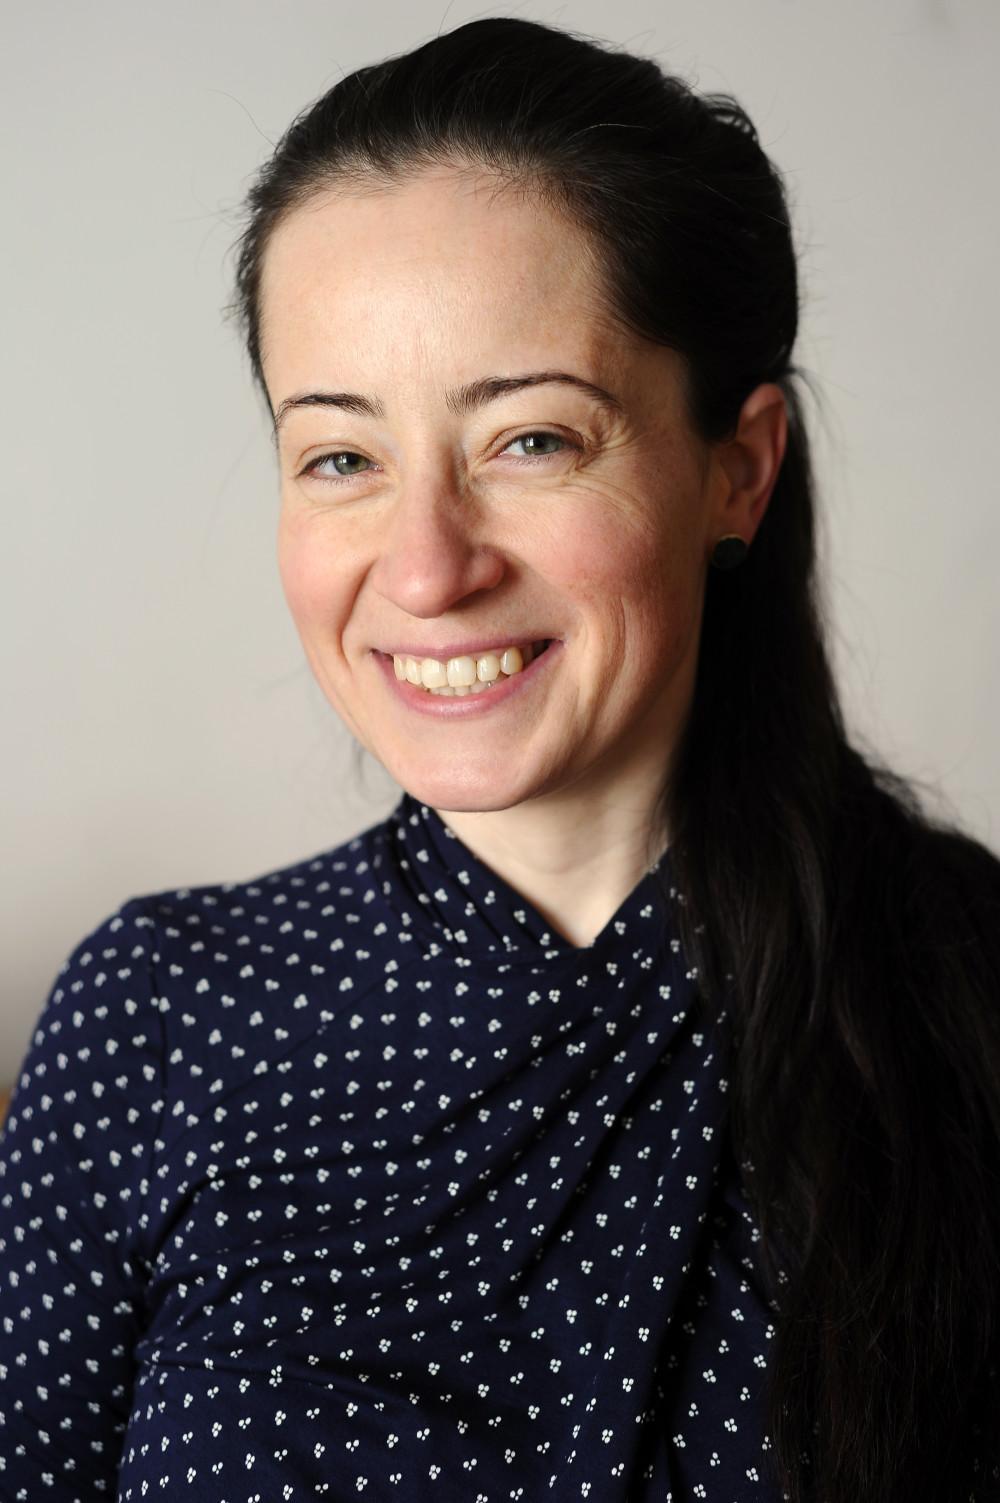 Andreea Tanase